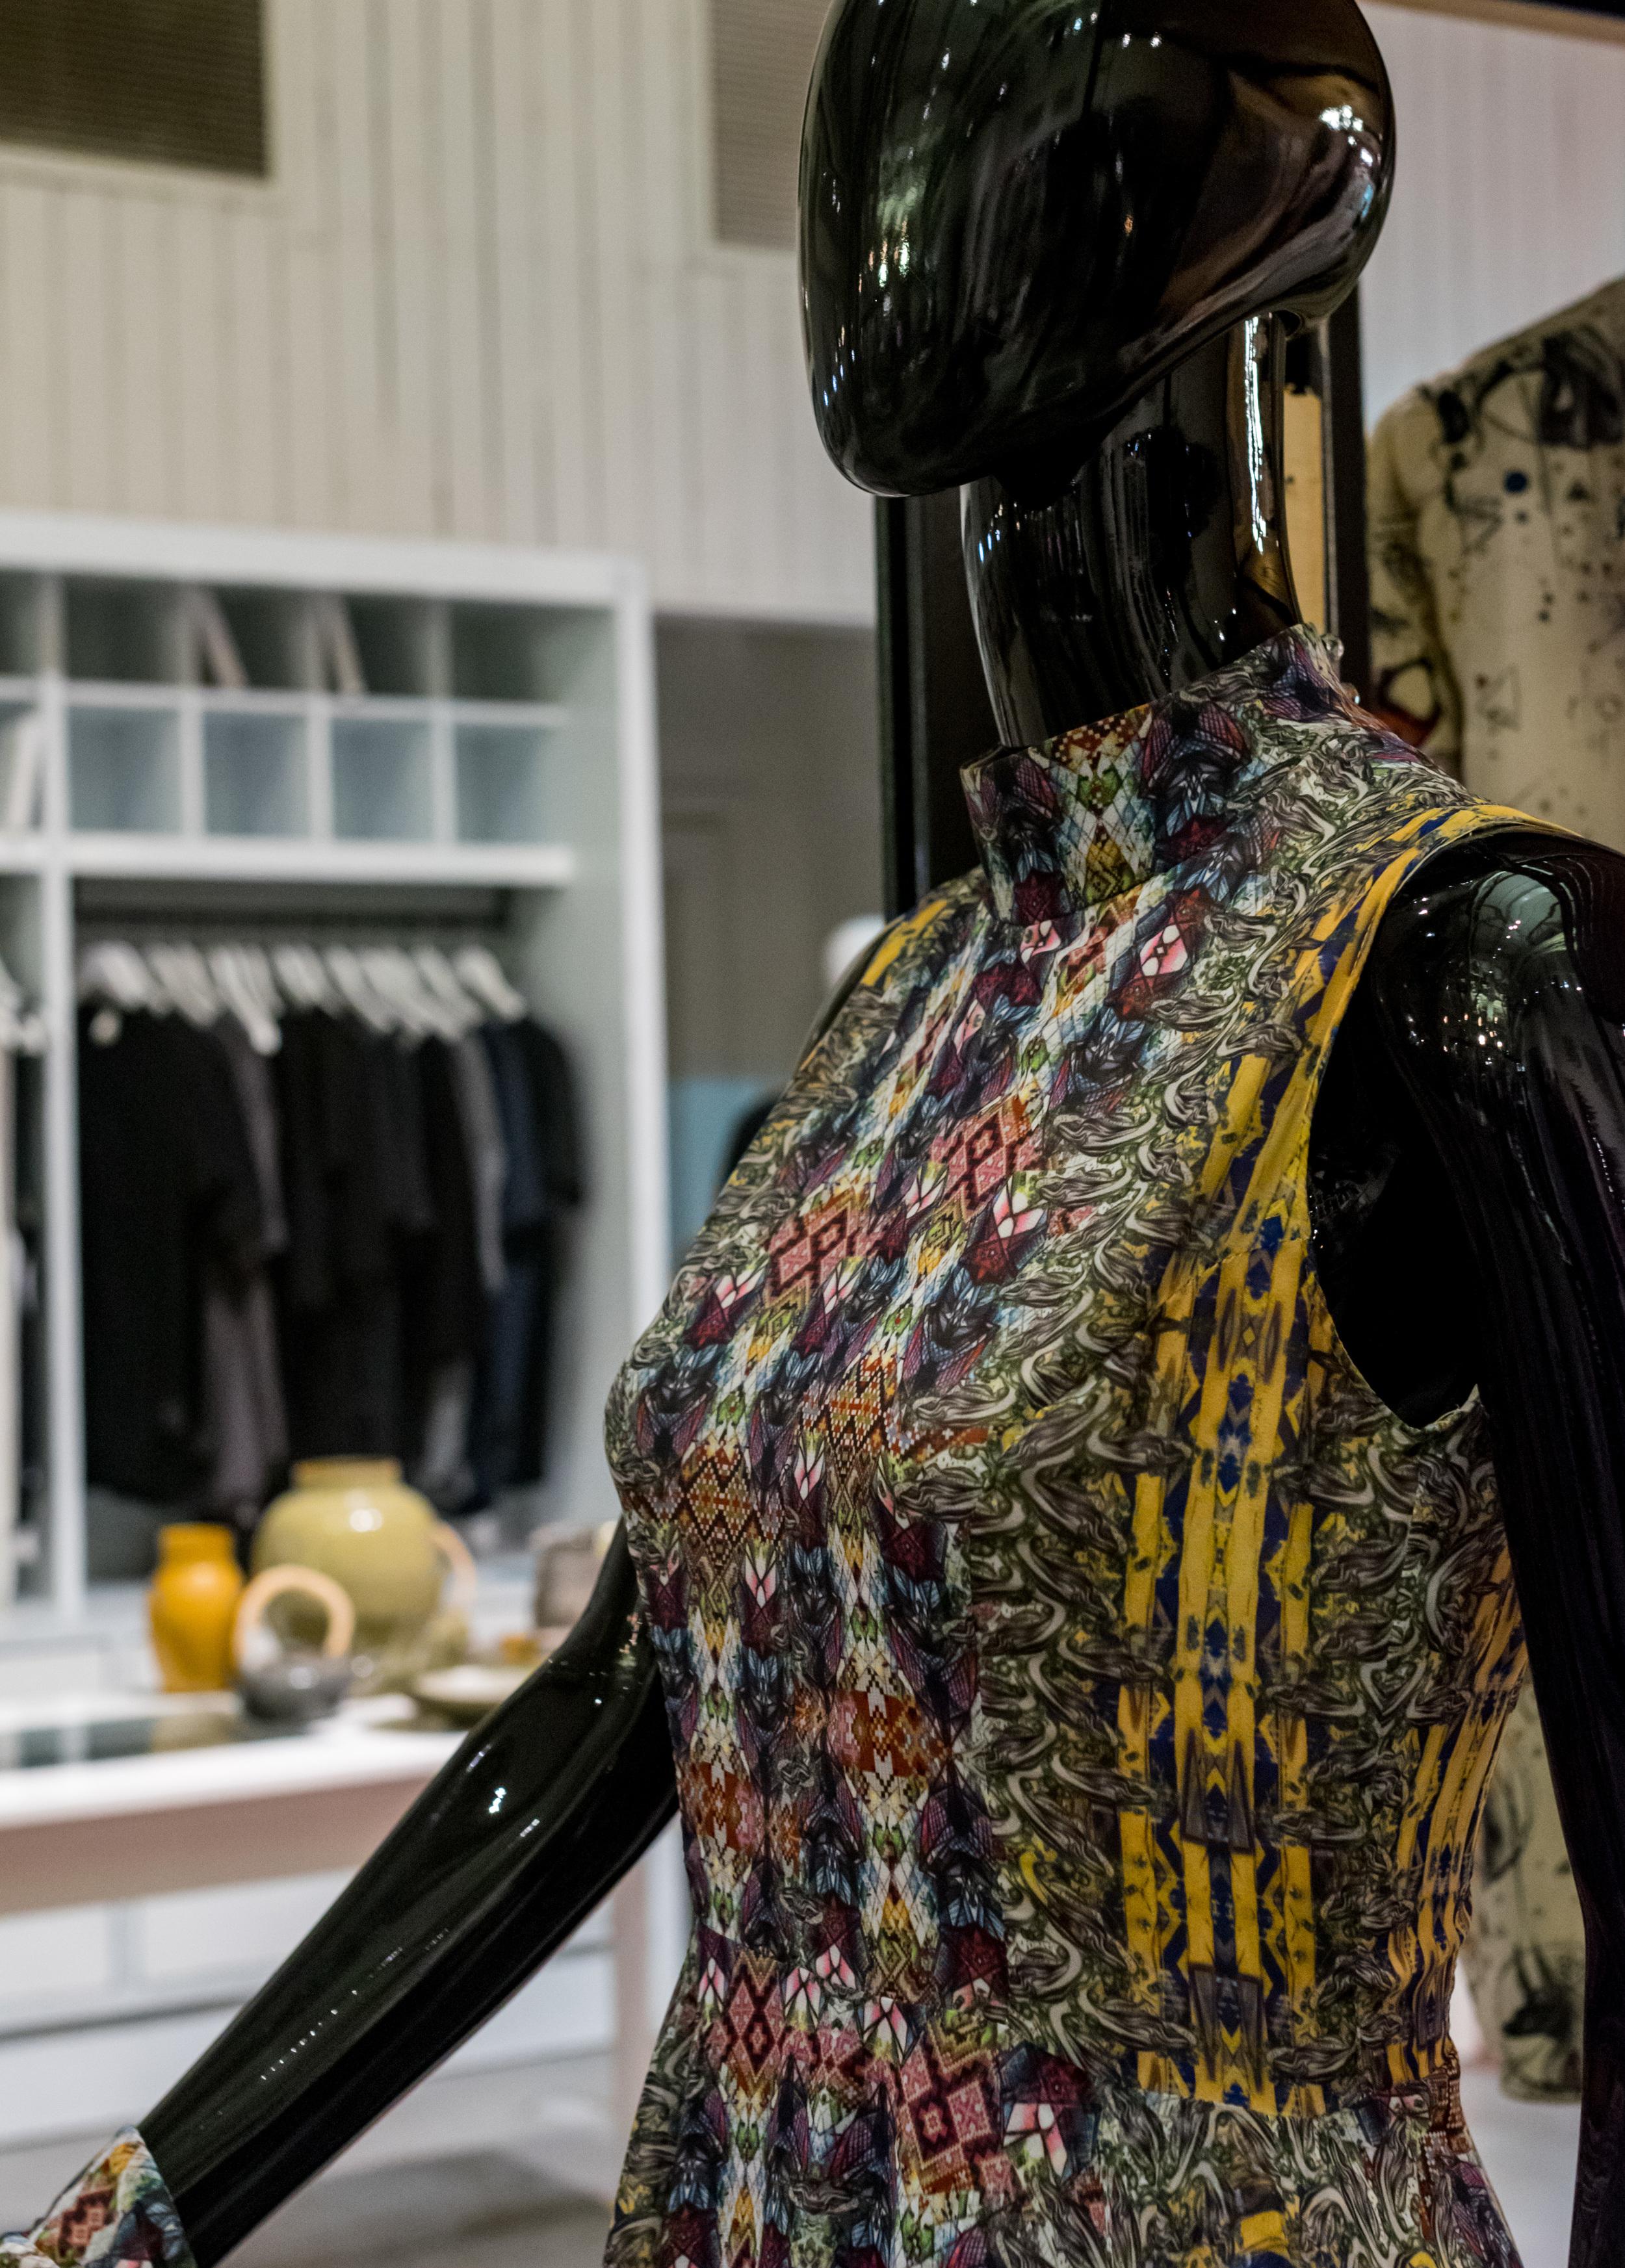 Dress by Michal Hidas - detail